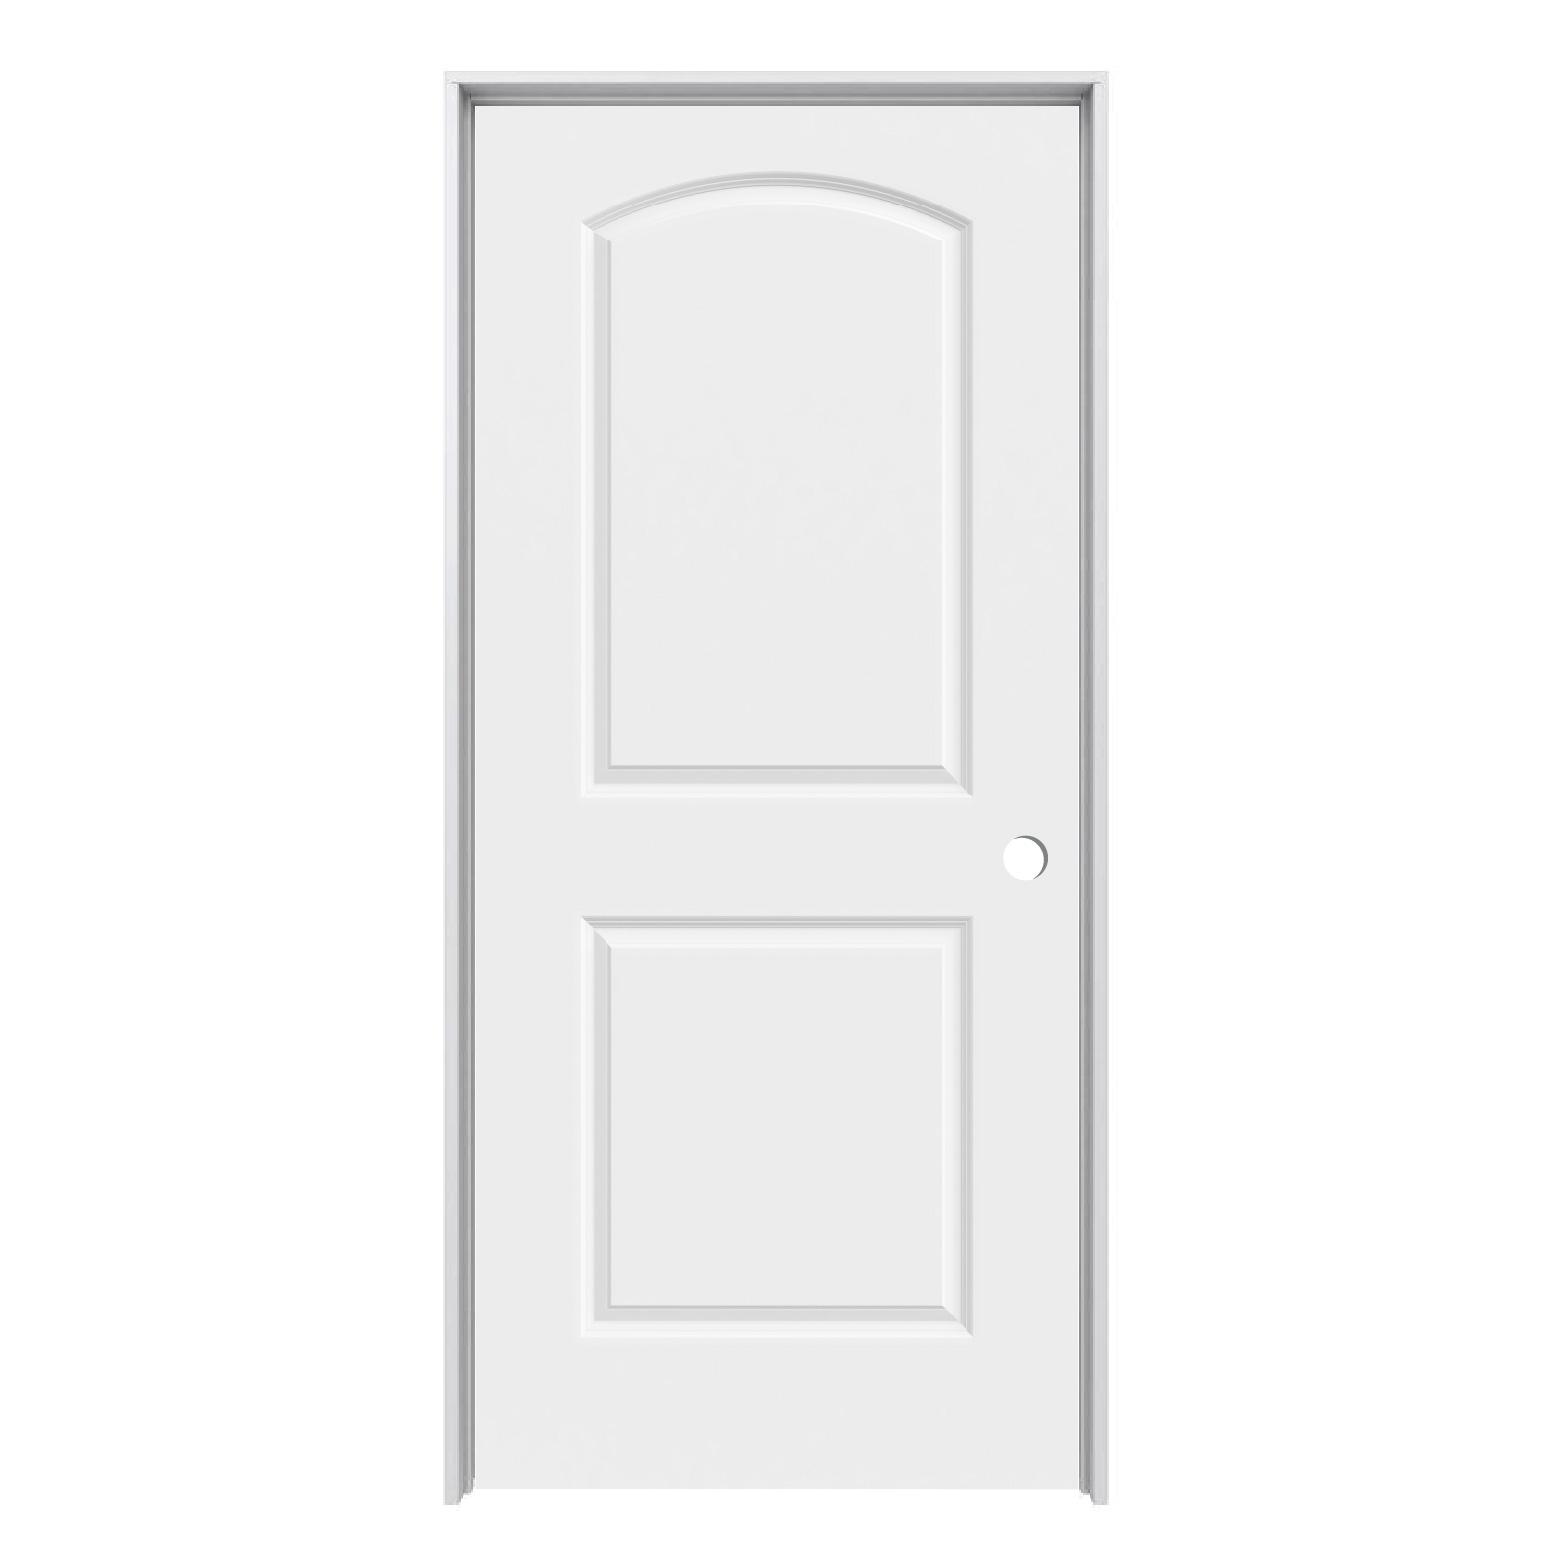 Solid core arch continental 2 panel prehung door lh 32 - Interior prehung solid core doors ...